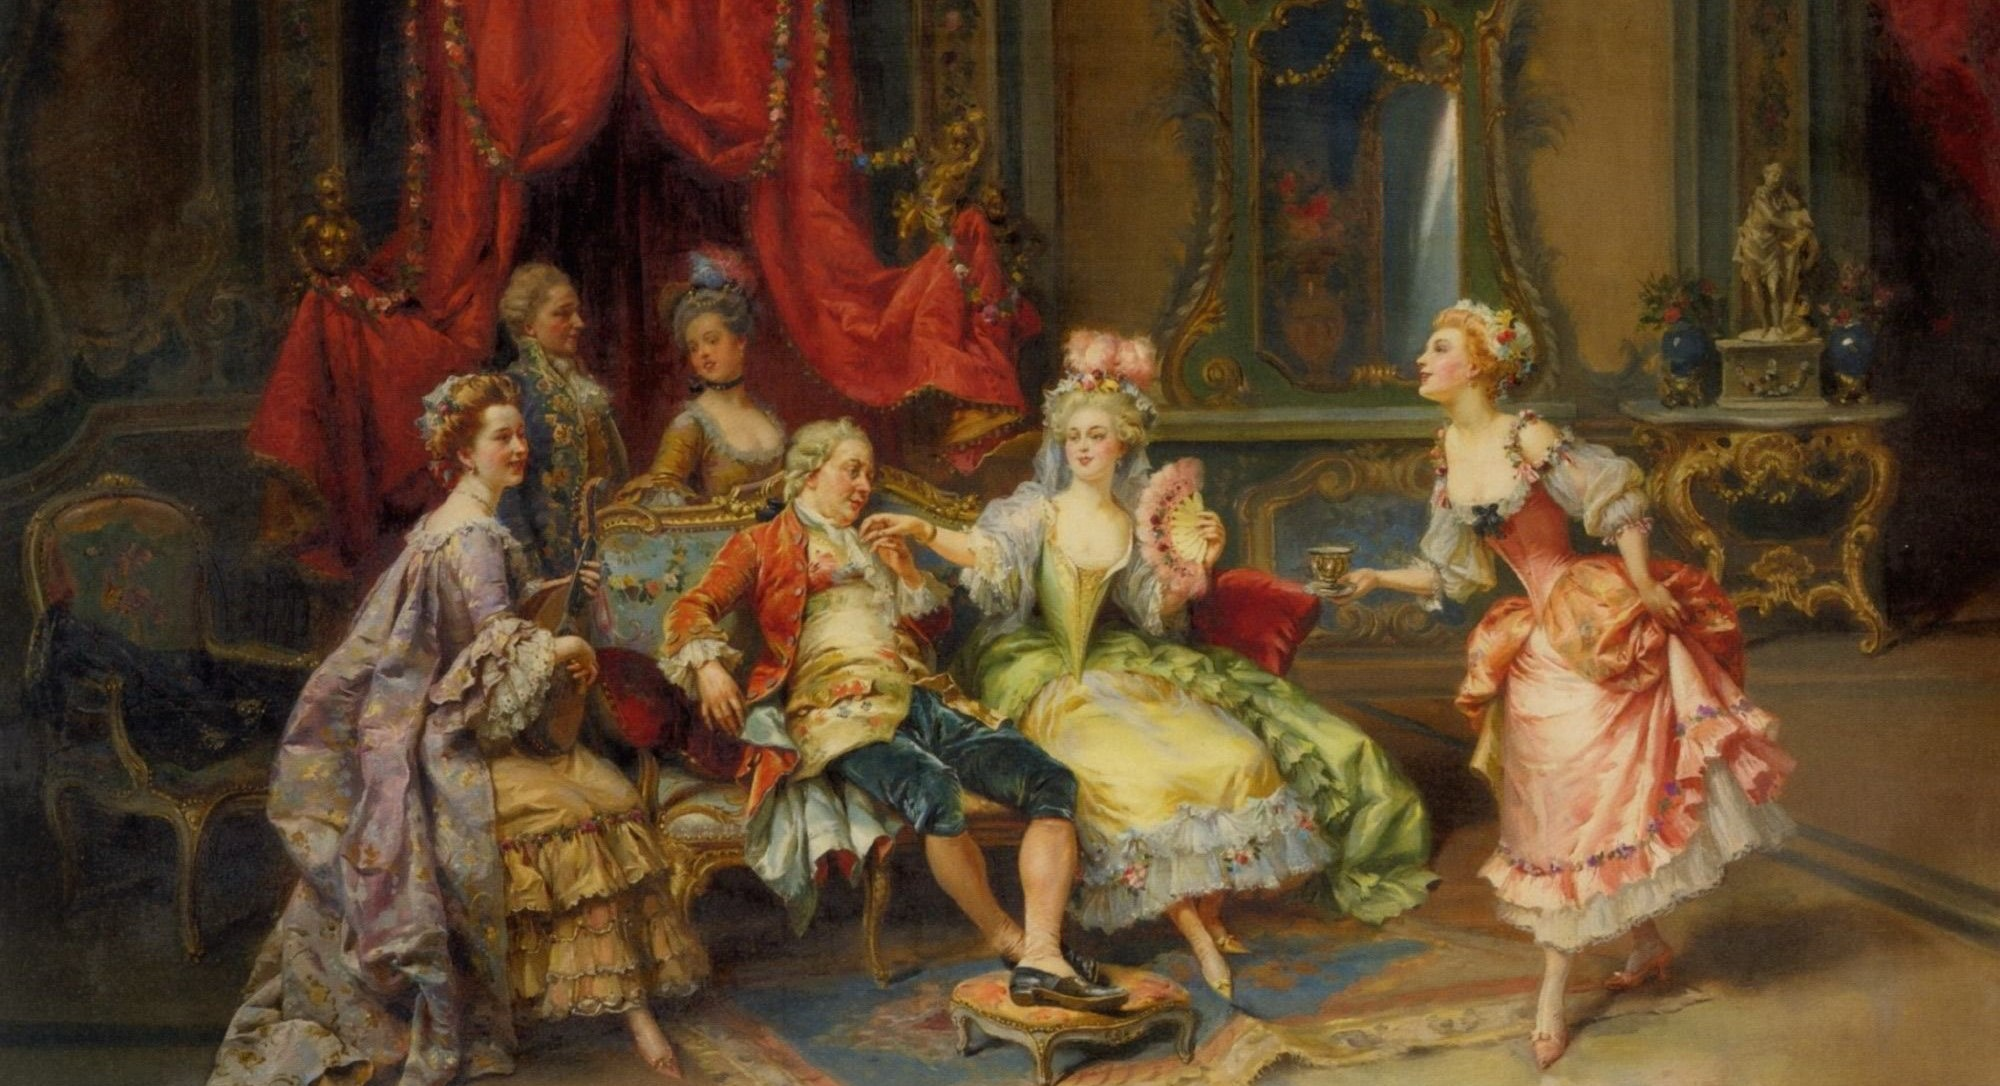 Sedie Ottocento Francese : Caratteri distintivi dei mobili in stile luigi xv